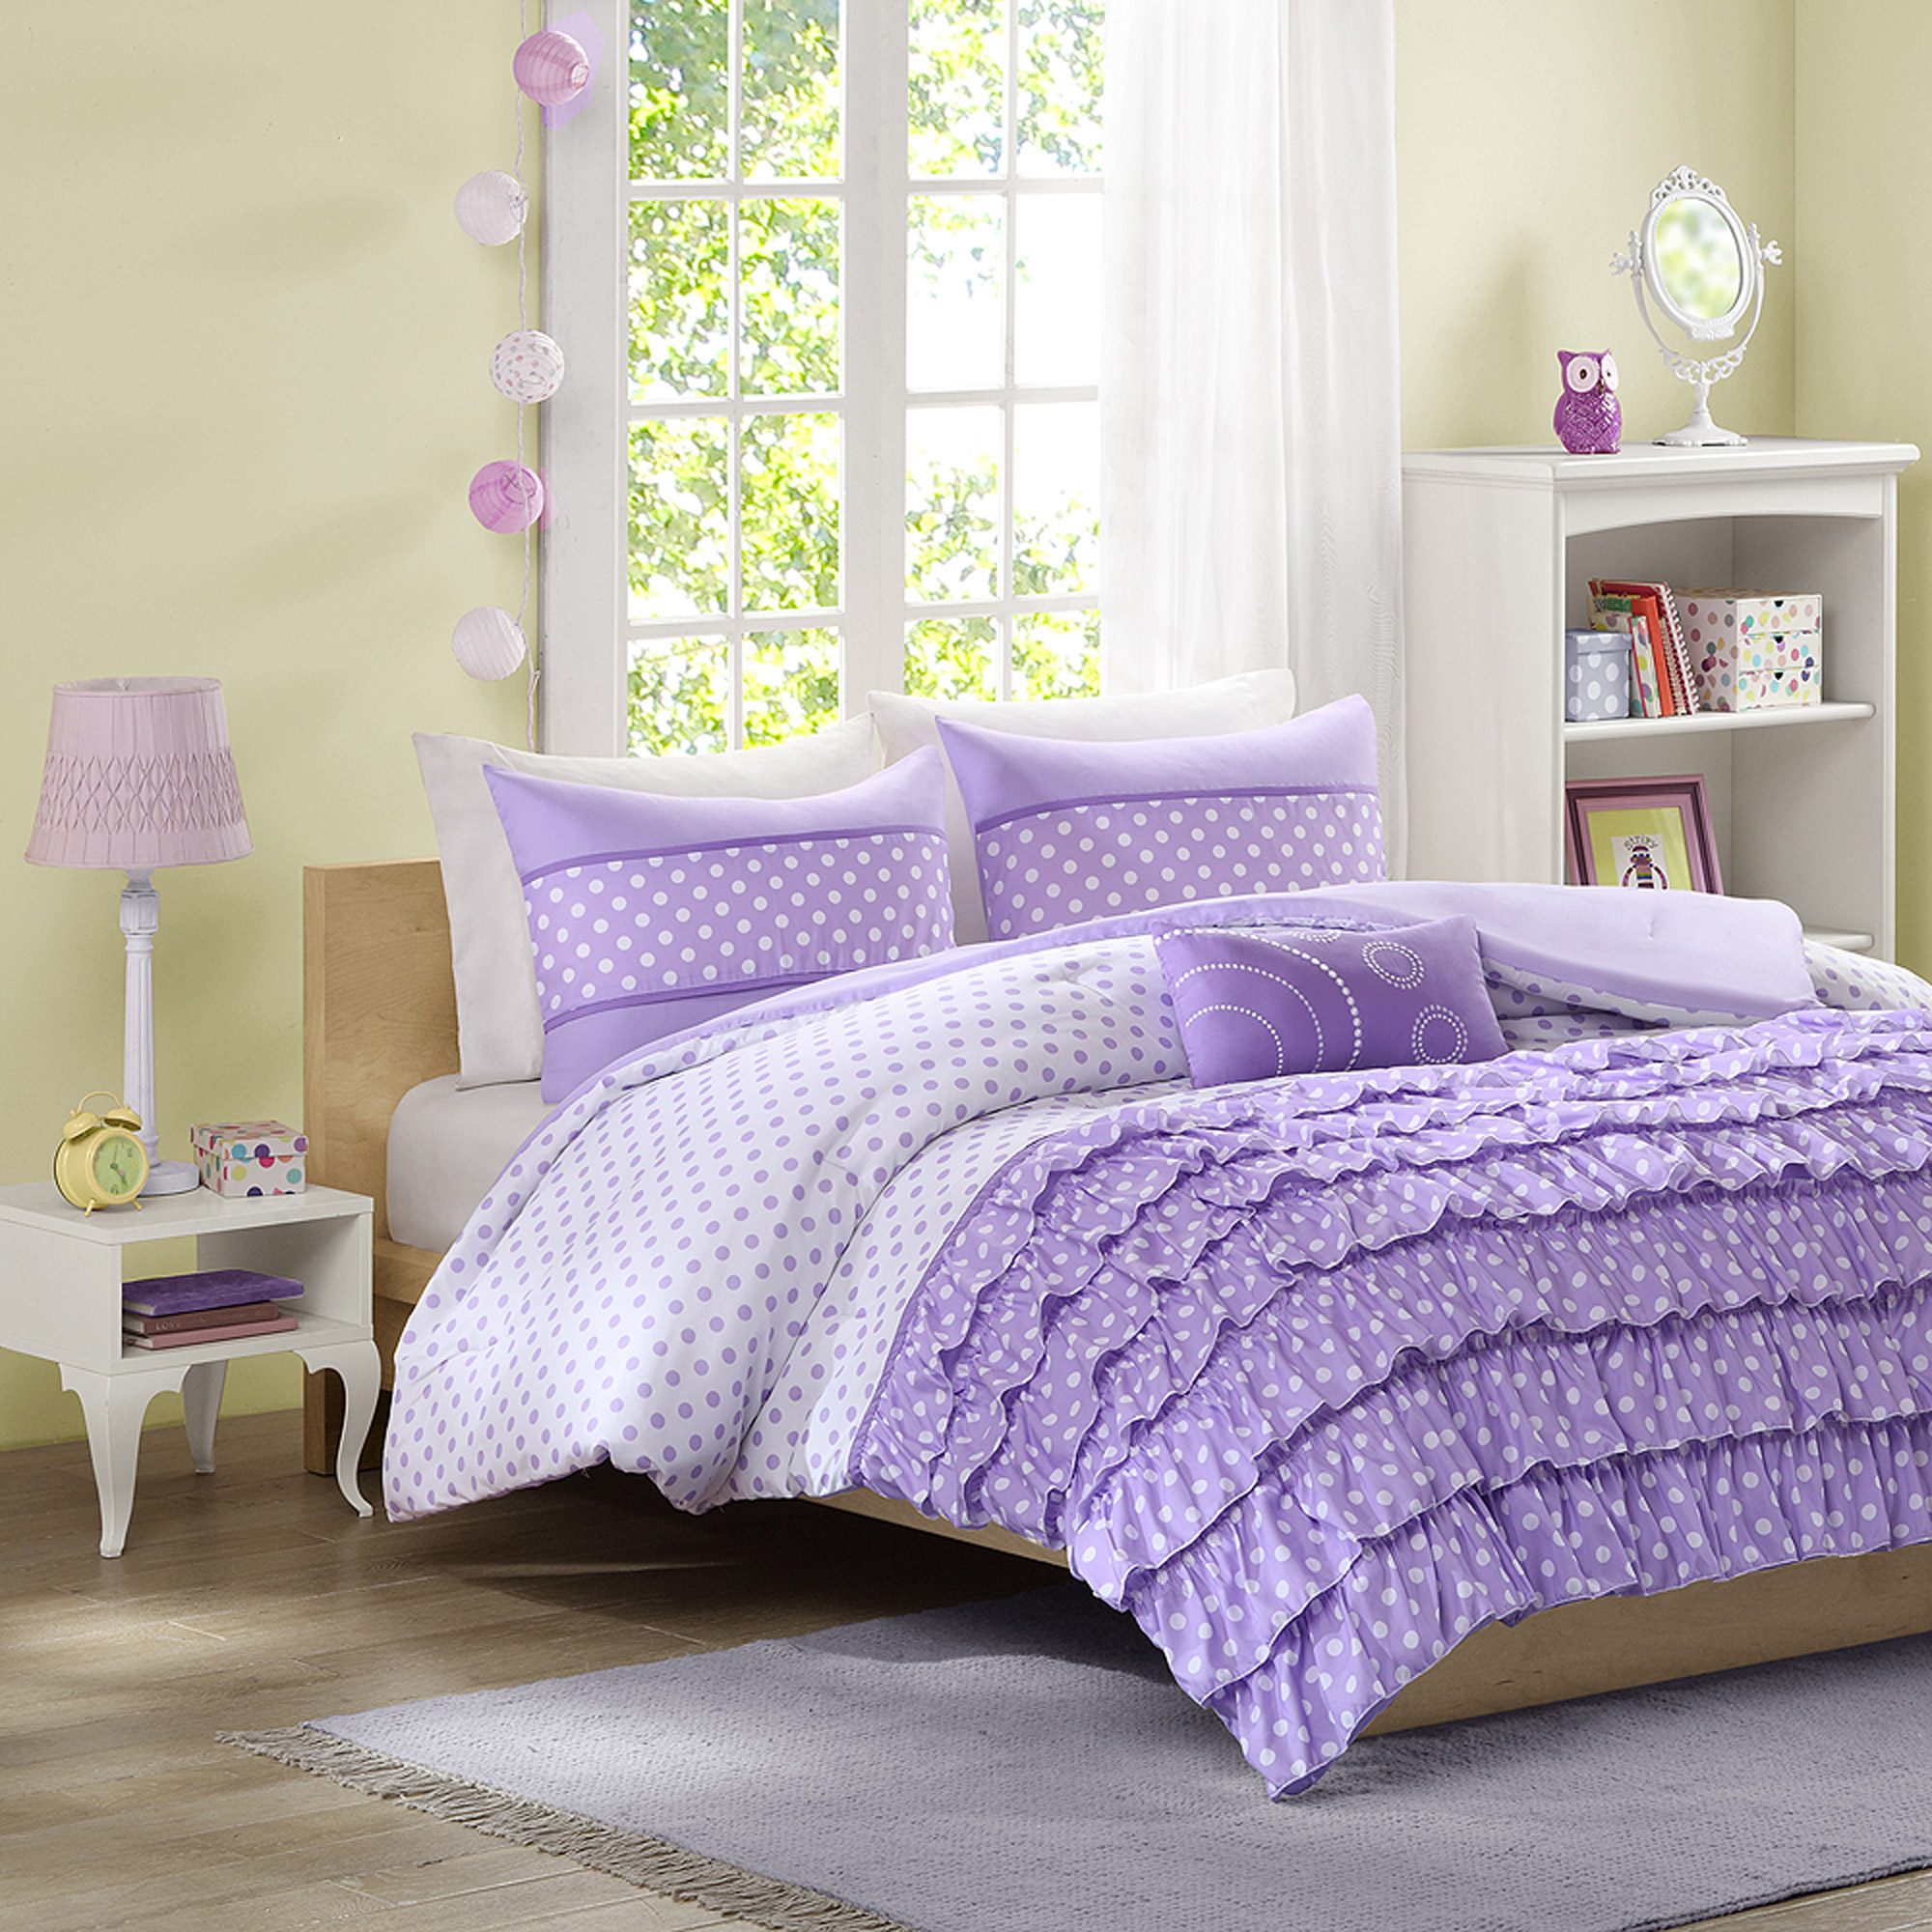 Home Essence Apartment Lindsey Bedding Comforter Set